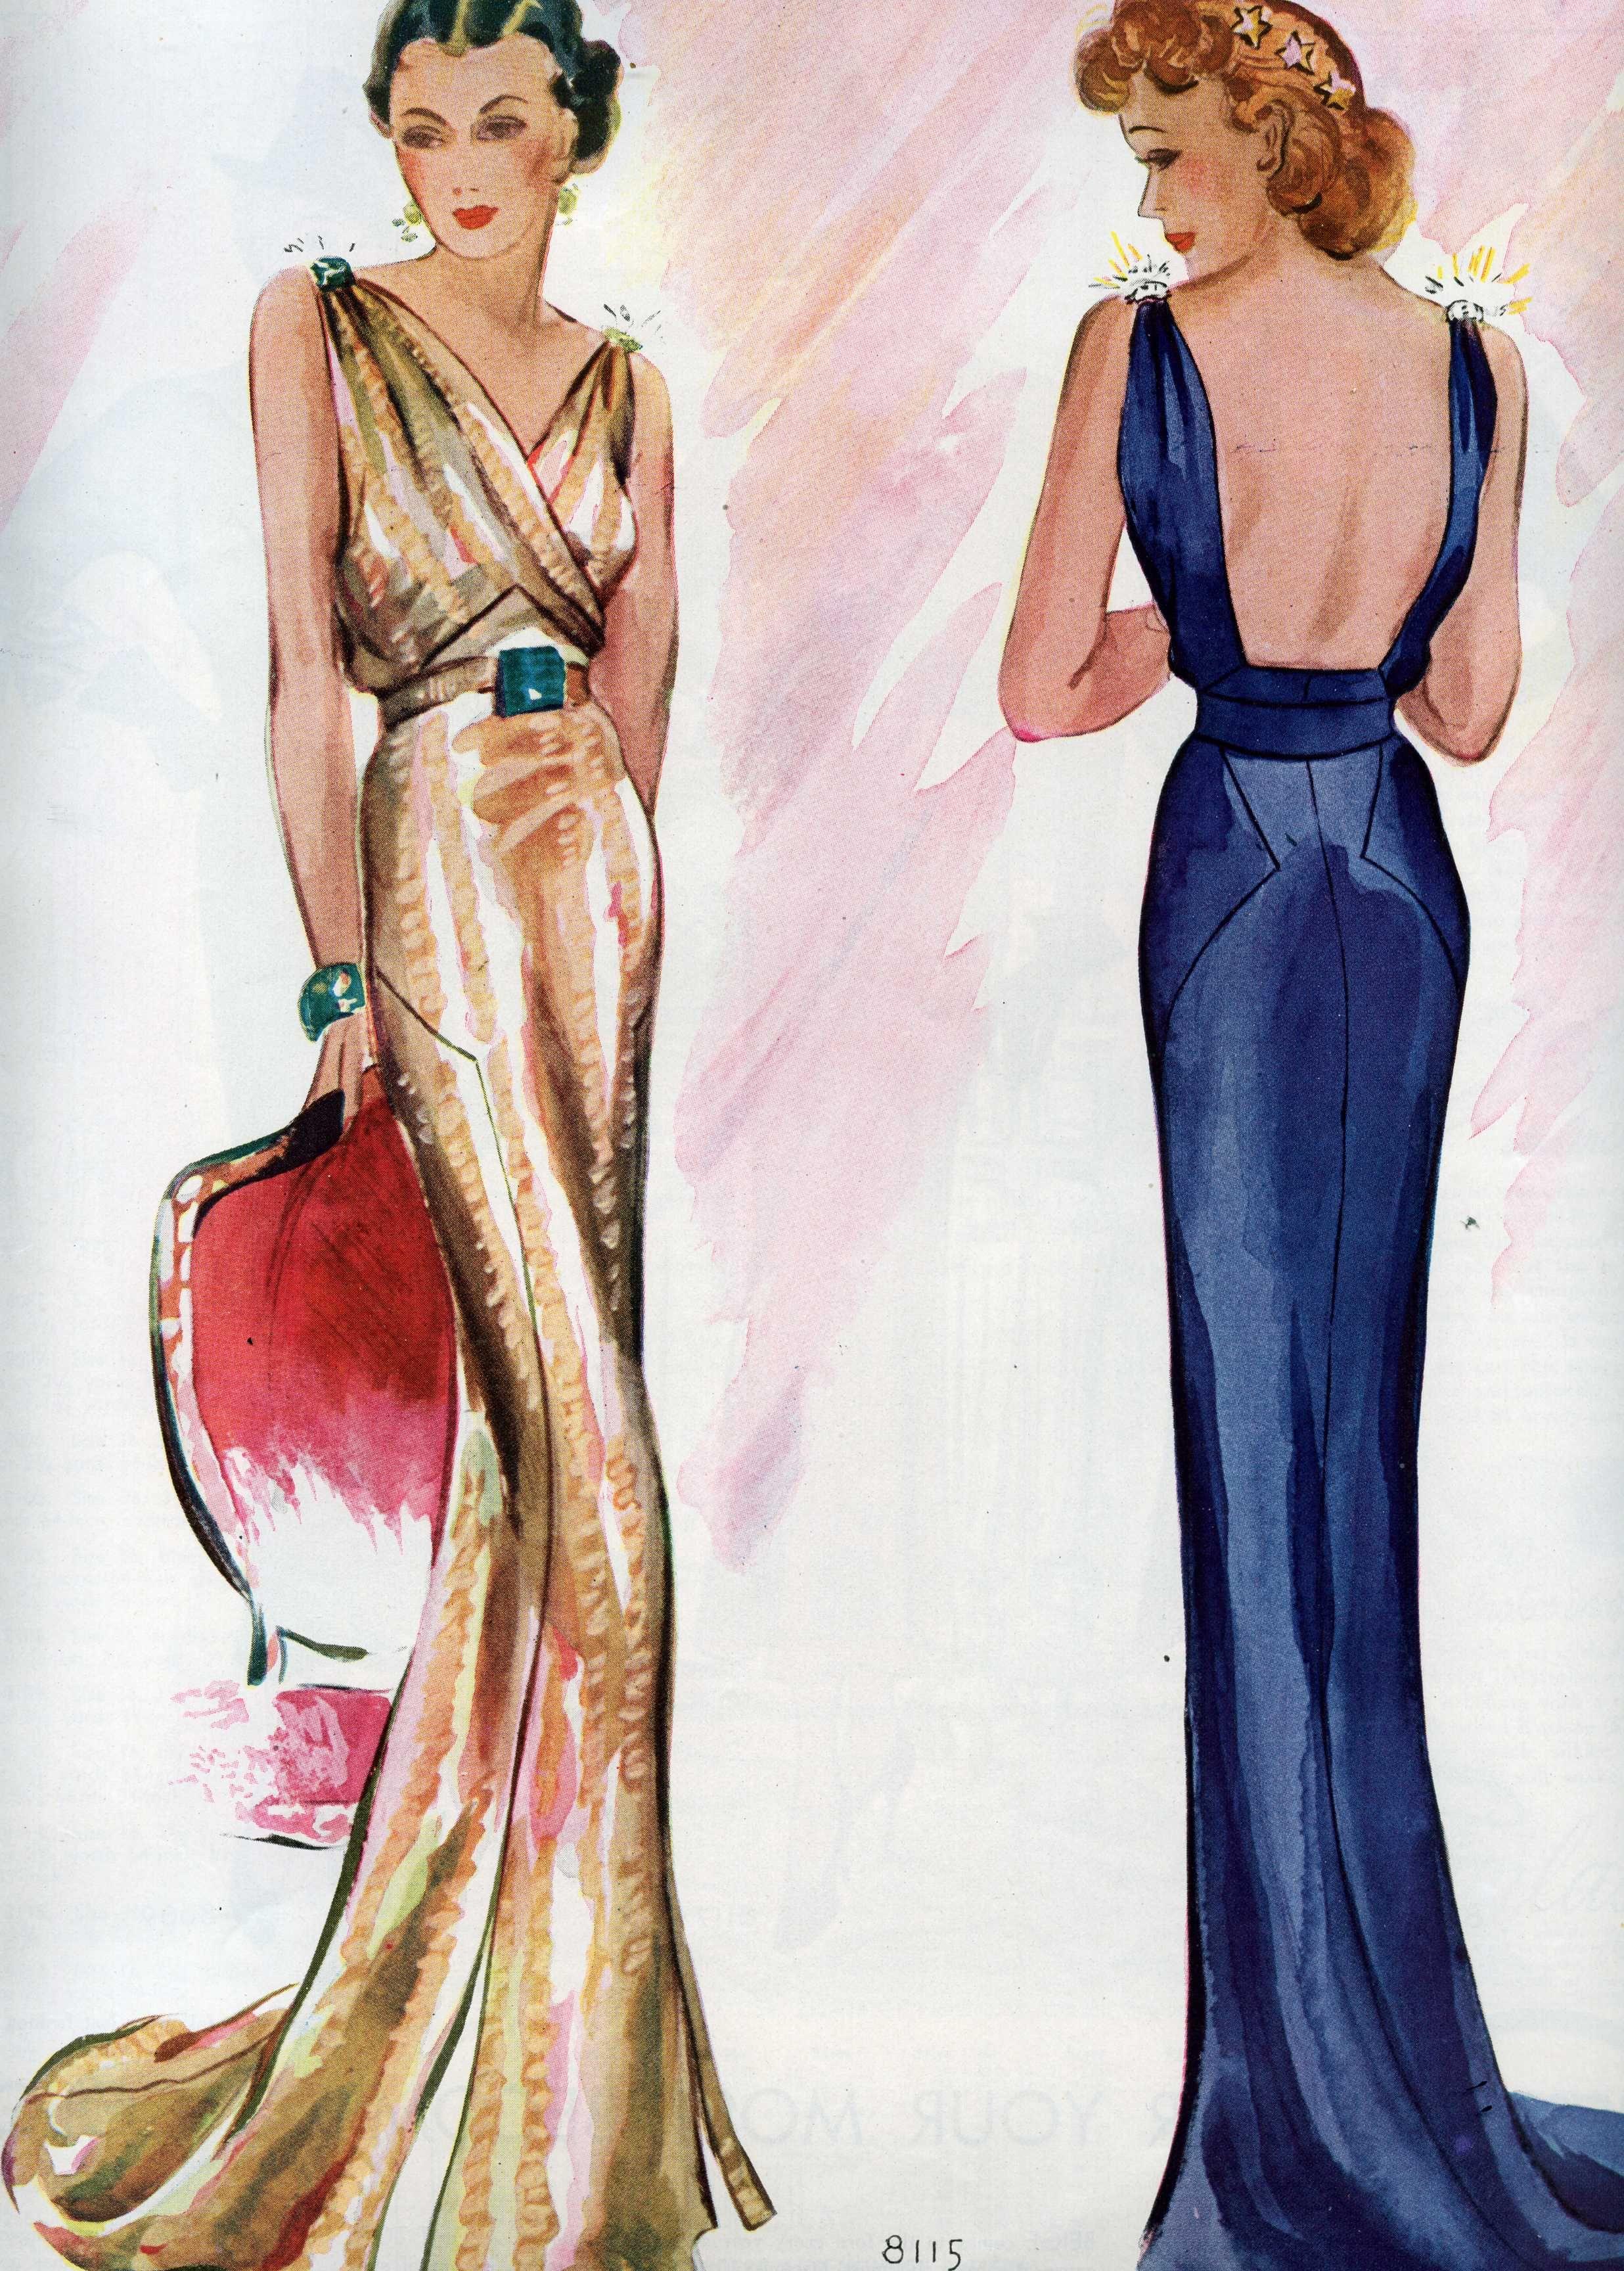 Abiti Da Cerimonia Vintage.Abiti Da Sera Vintage 1935 Moda Anni 30 Vestiti Vintage Vestiti